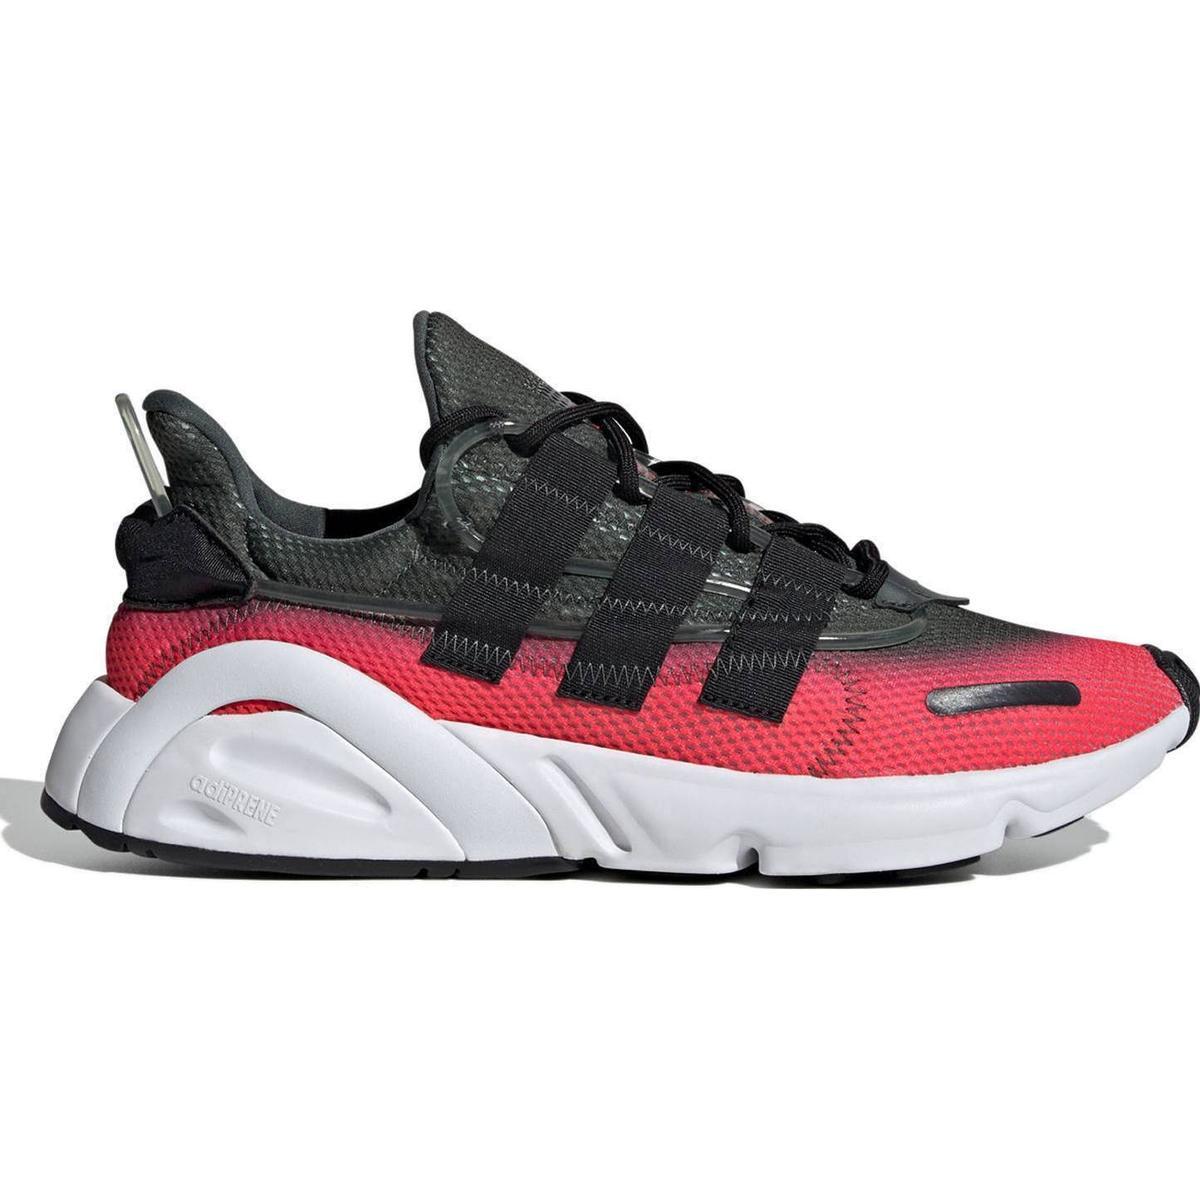 Adidas adiprene • Hitta det lägsta priset hos PriceRunner nu »